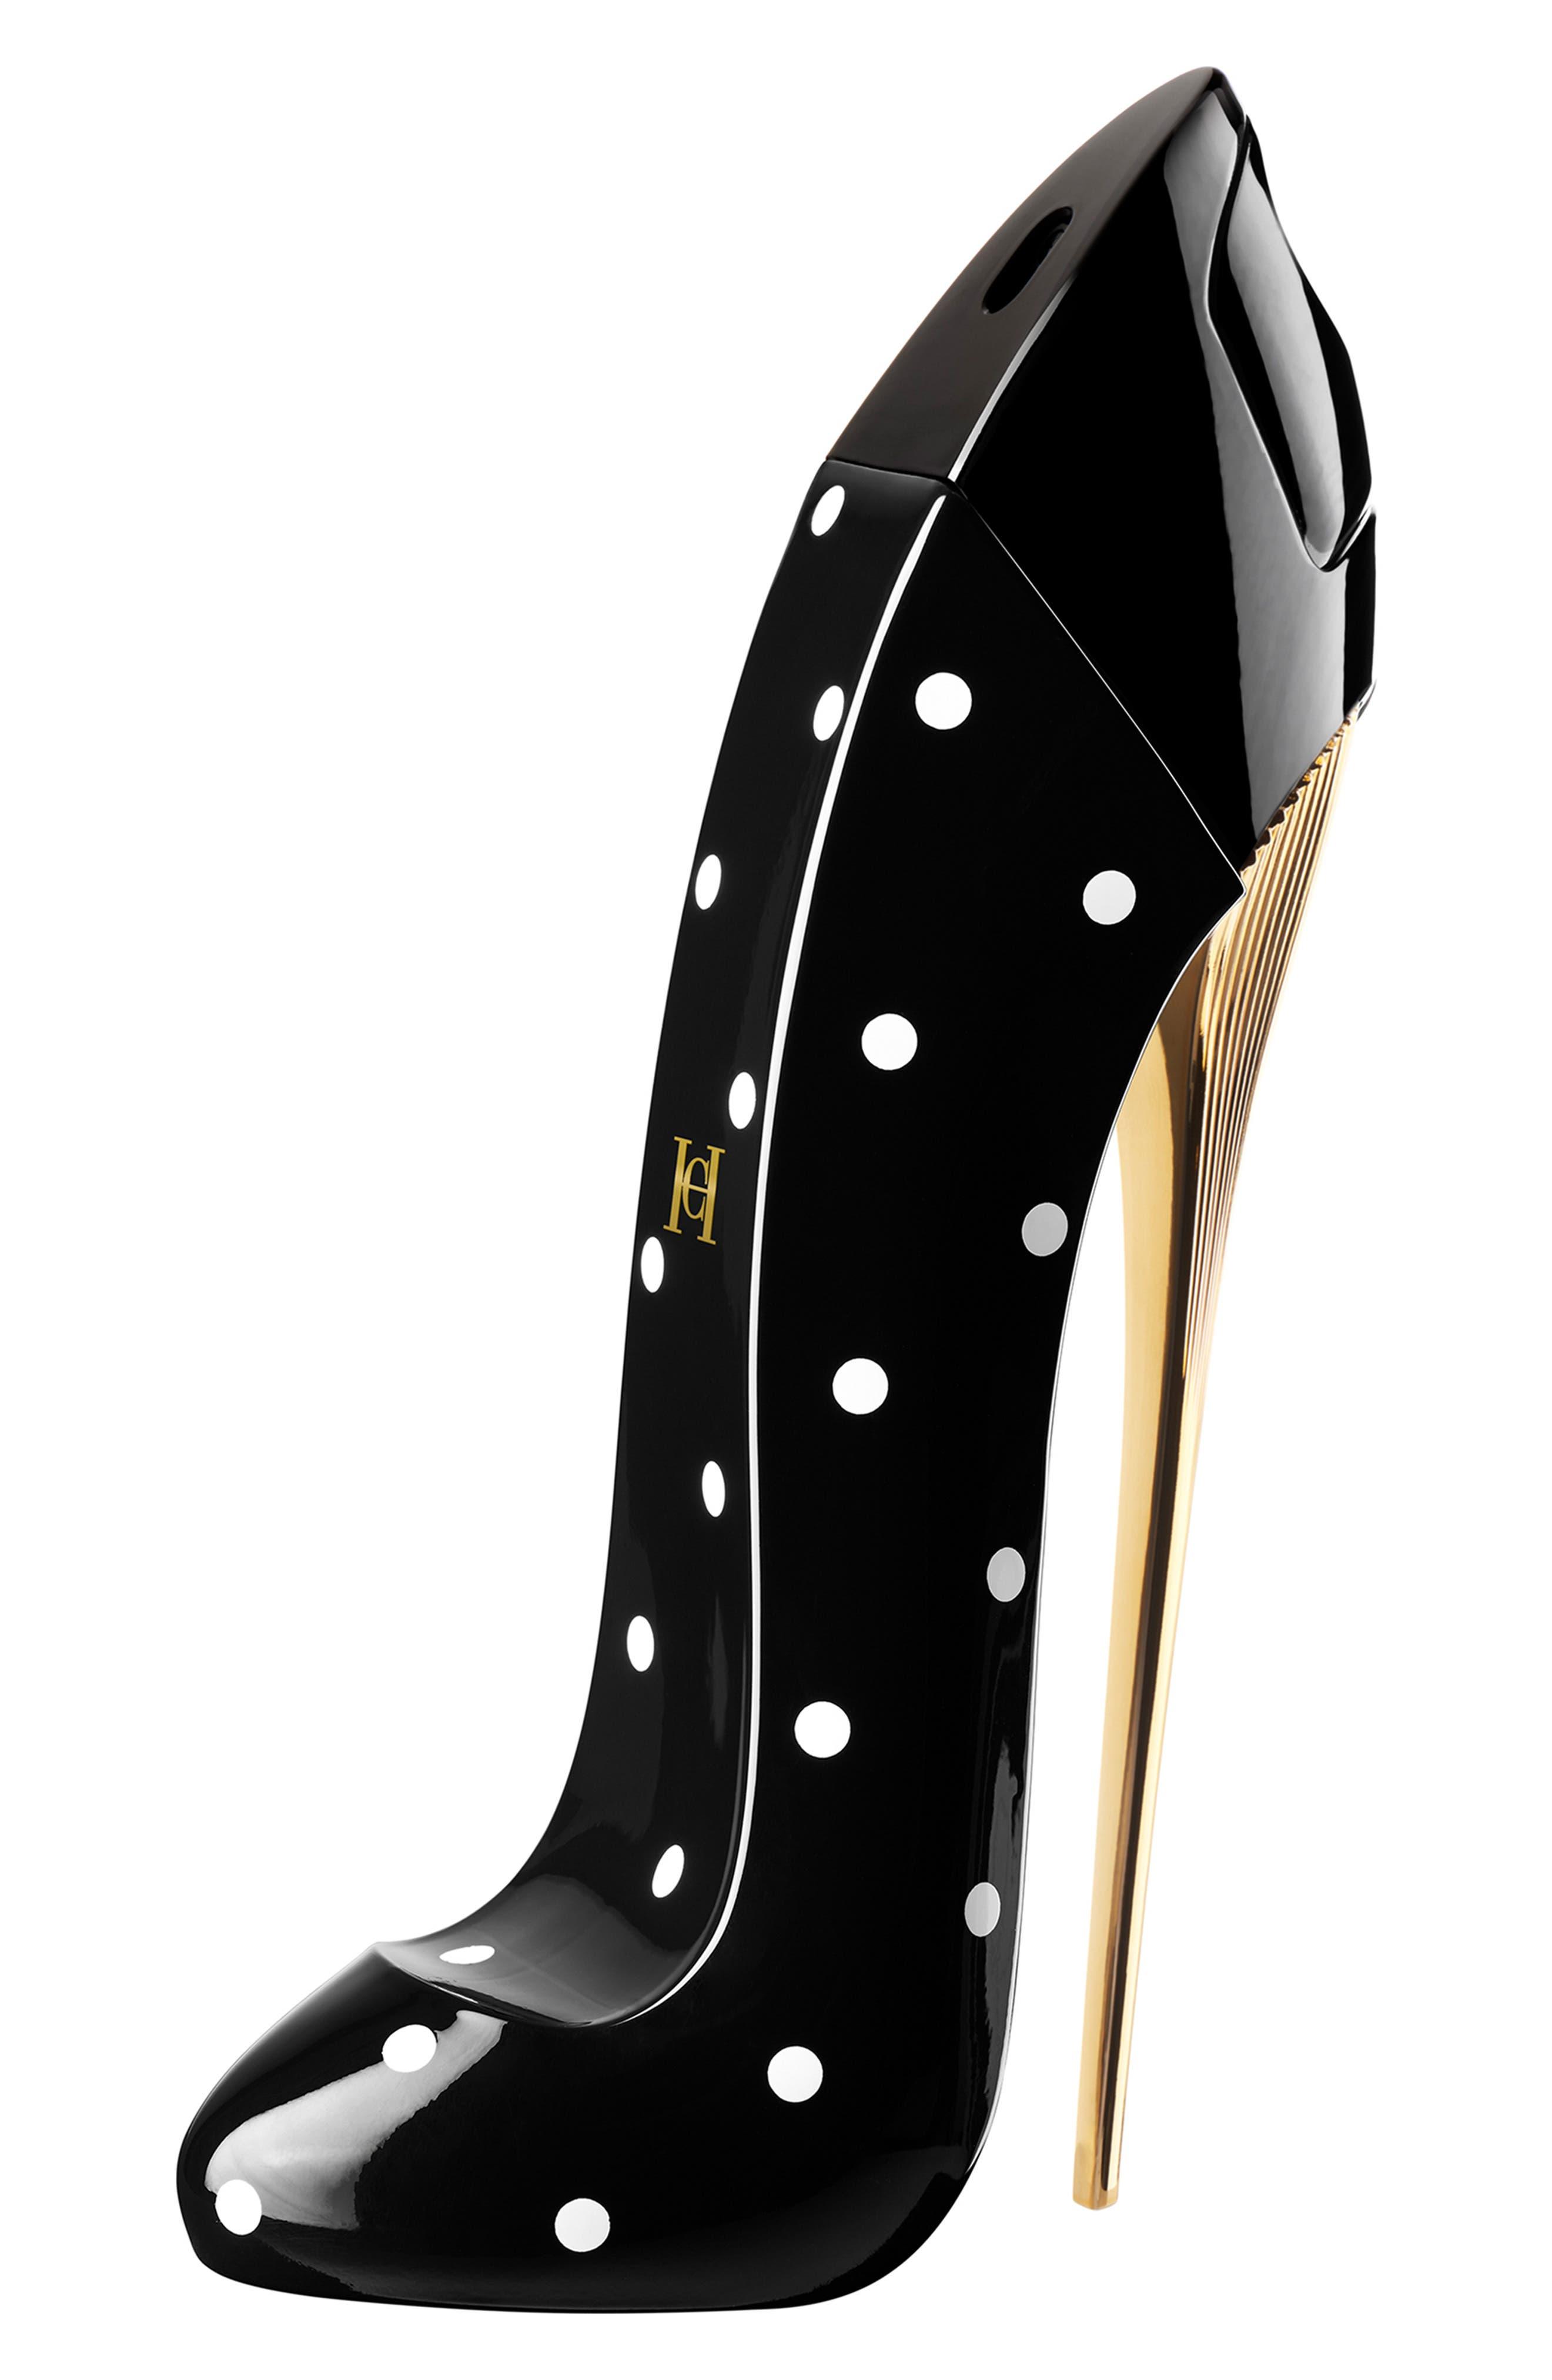 Carolina Herrera X Karlie Kloss Good Girl Dot Drama Eau De Parfum (Limited Edition)